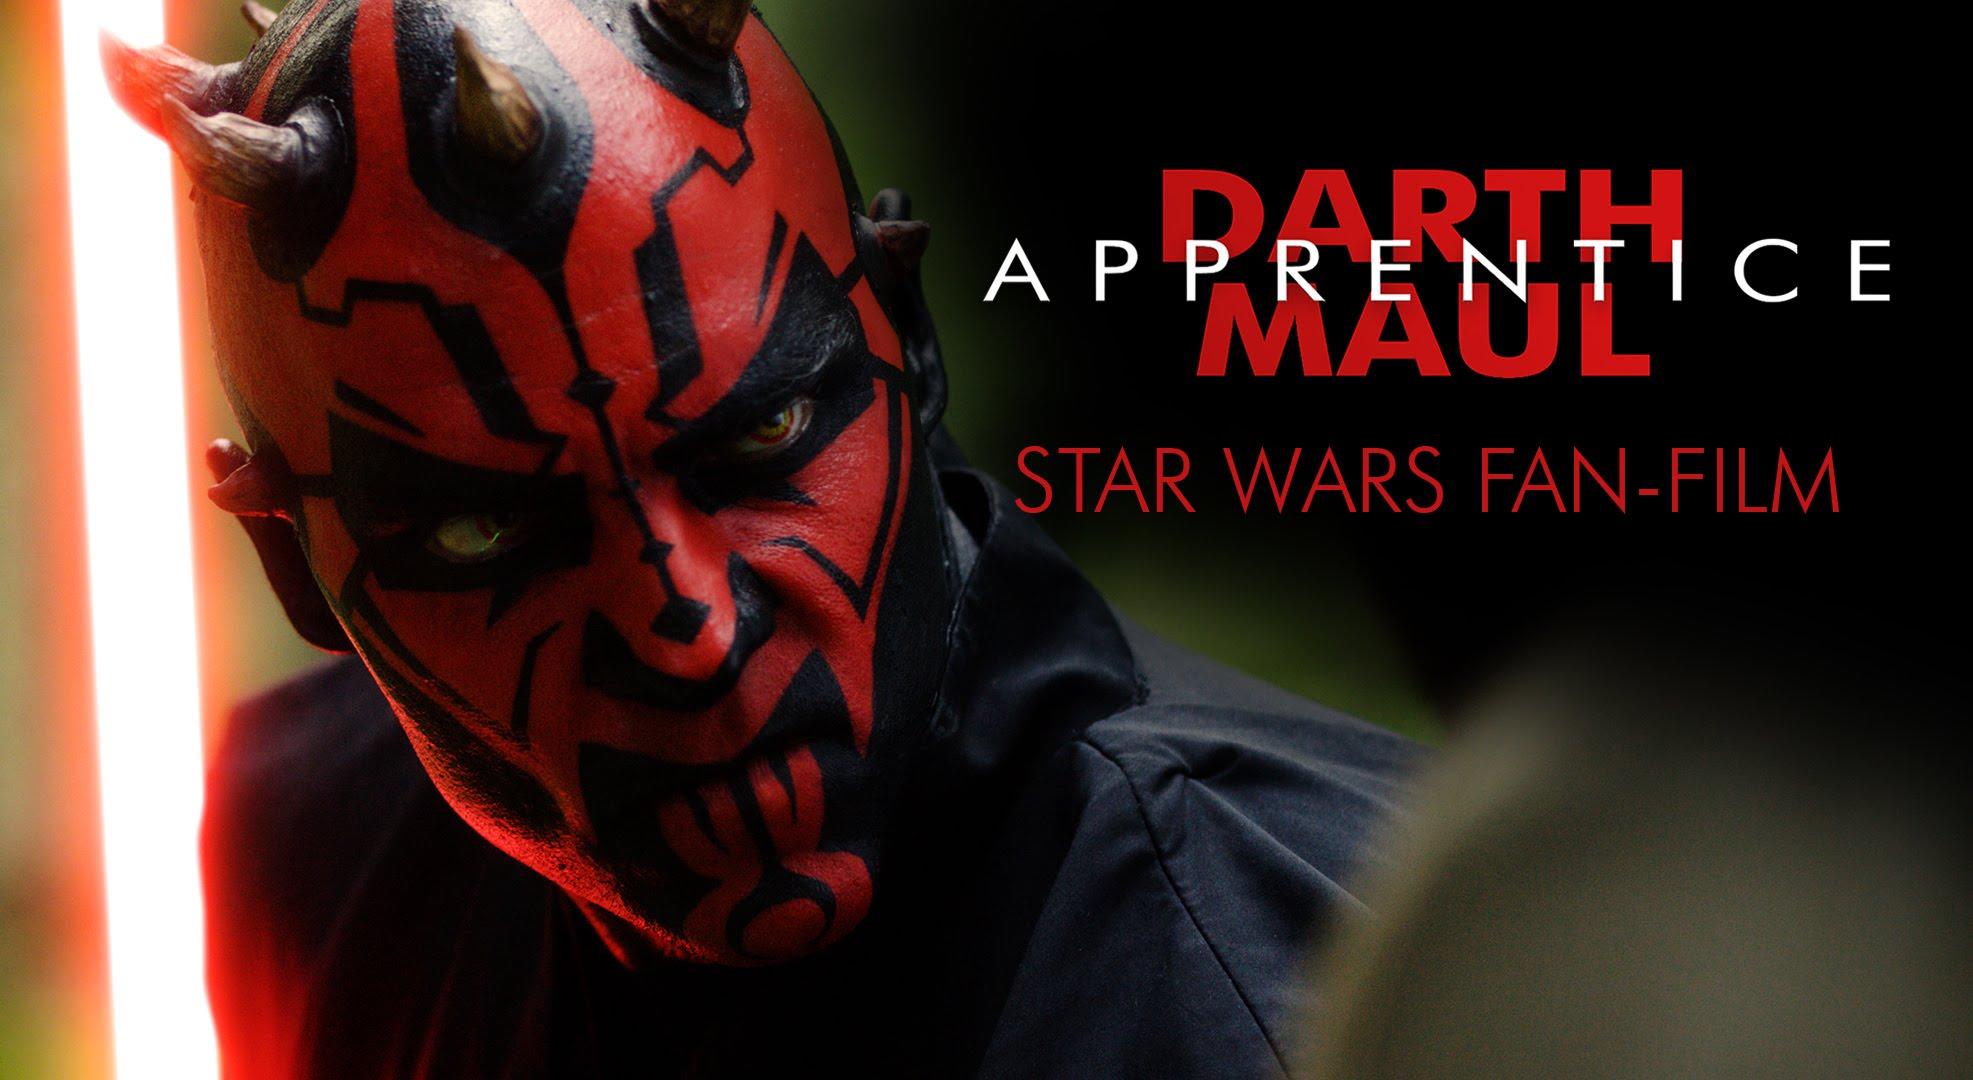 Darth Maul Fan Film Star Wars